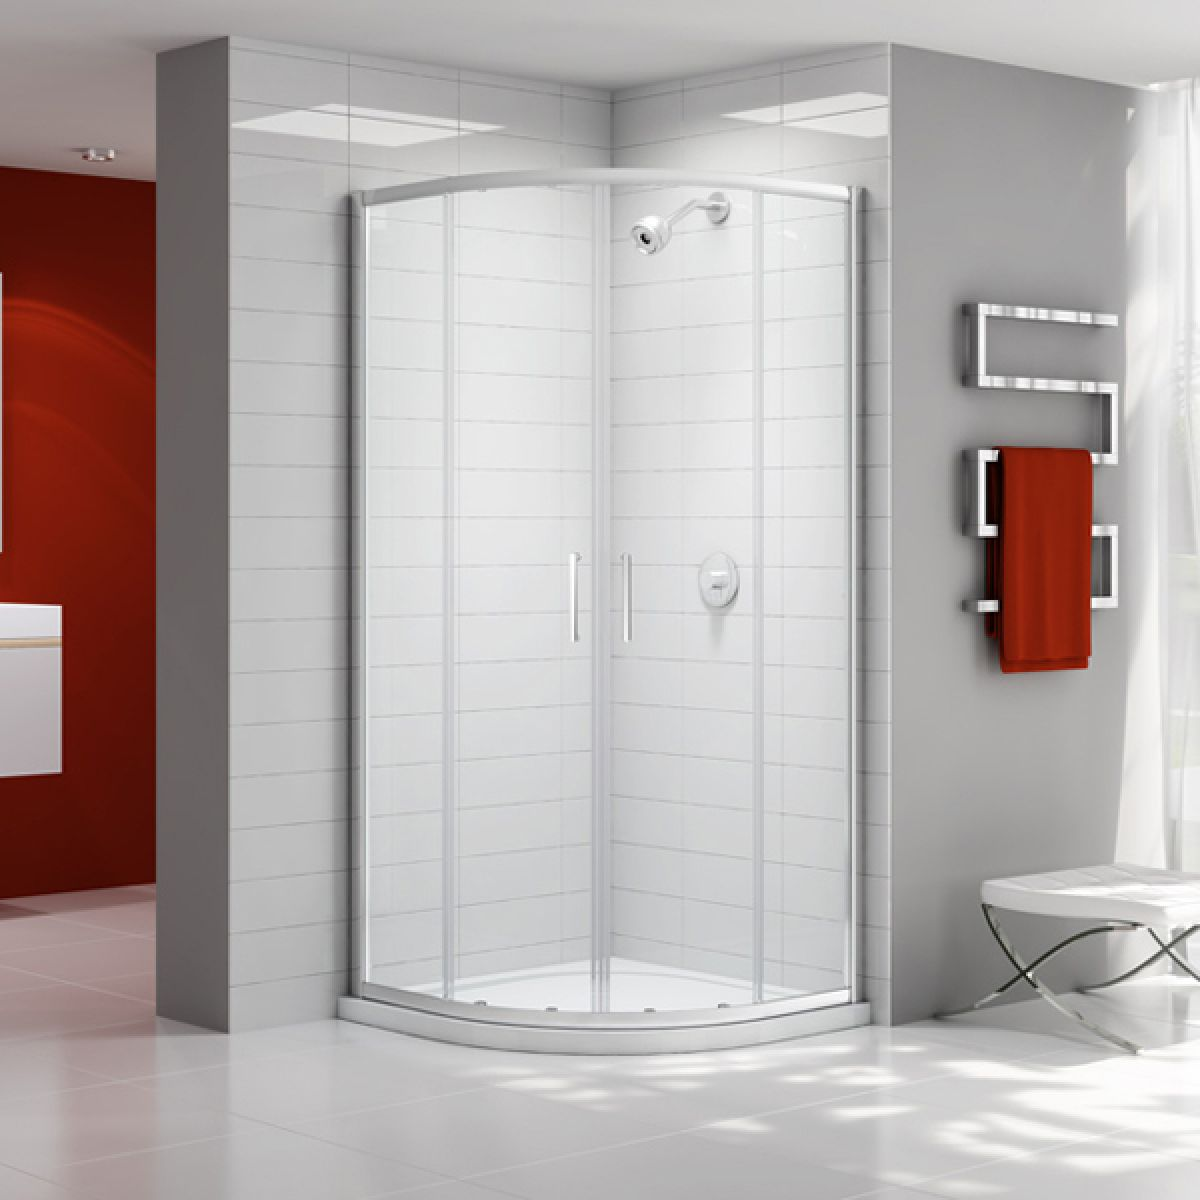 Merlyn Ionic Express Double Door Quadrant Shower Enclosure